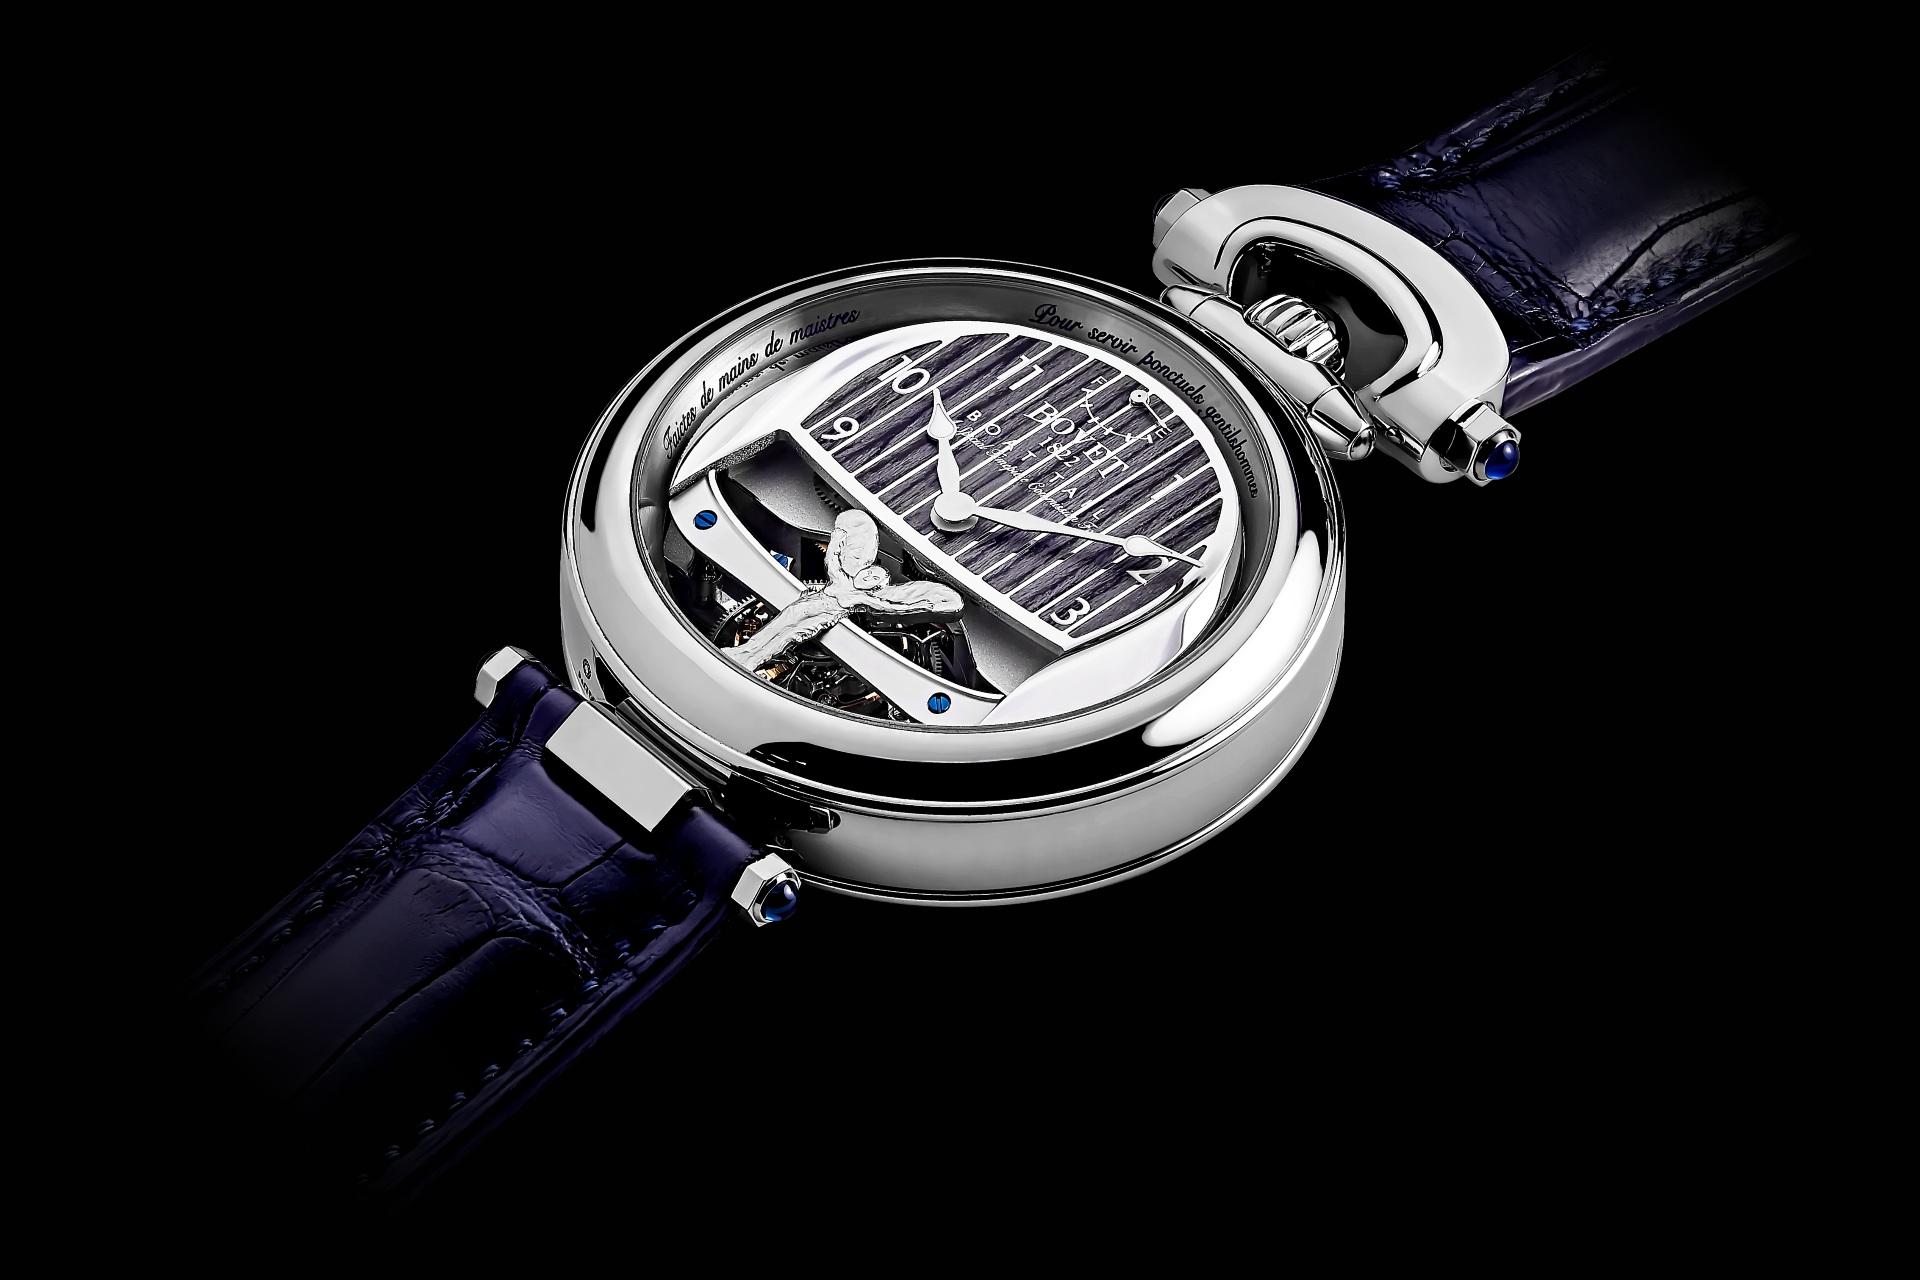 Bespoke timepiece 1 3 4